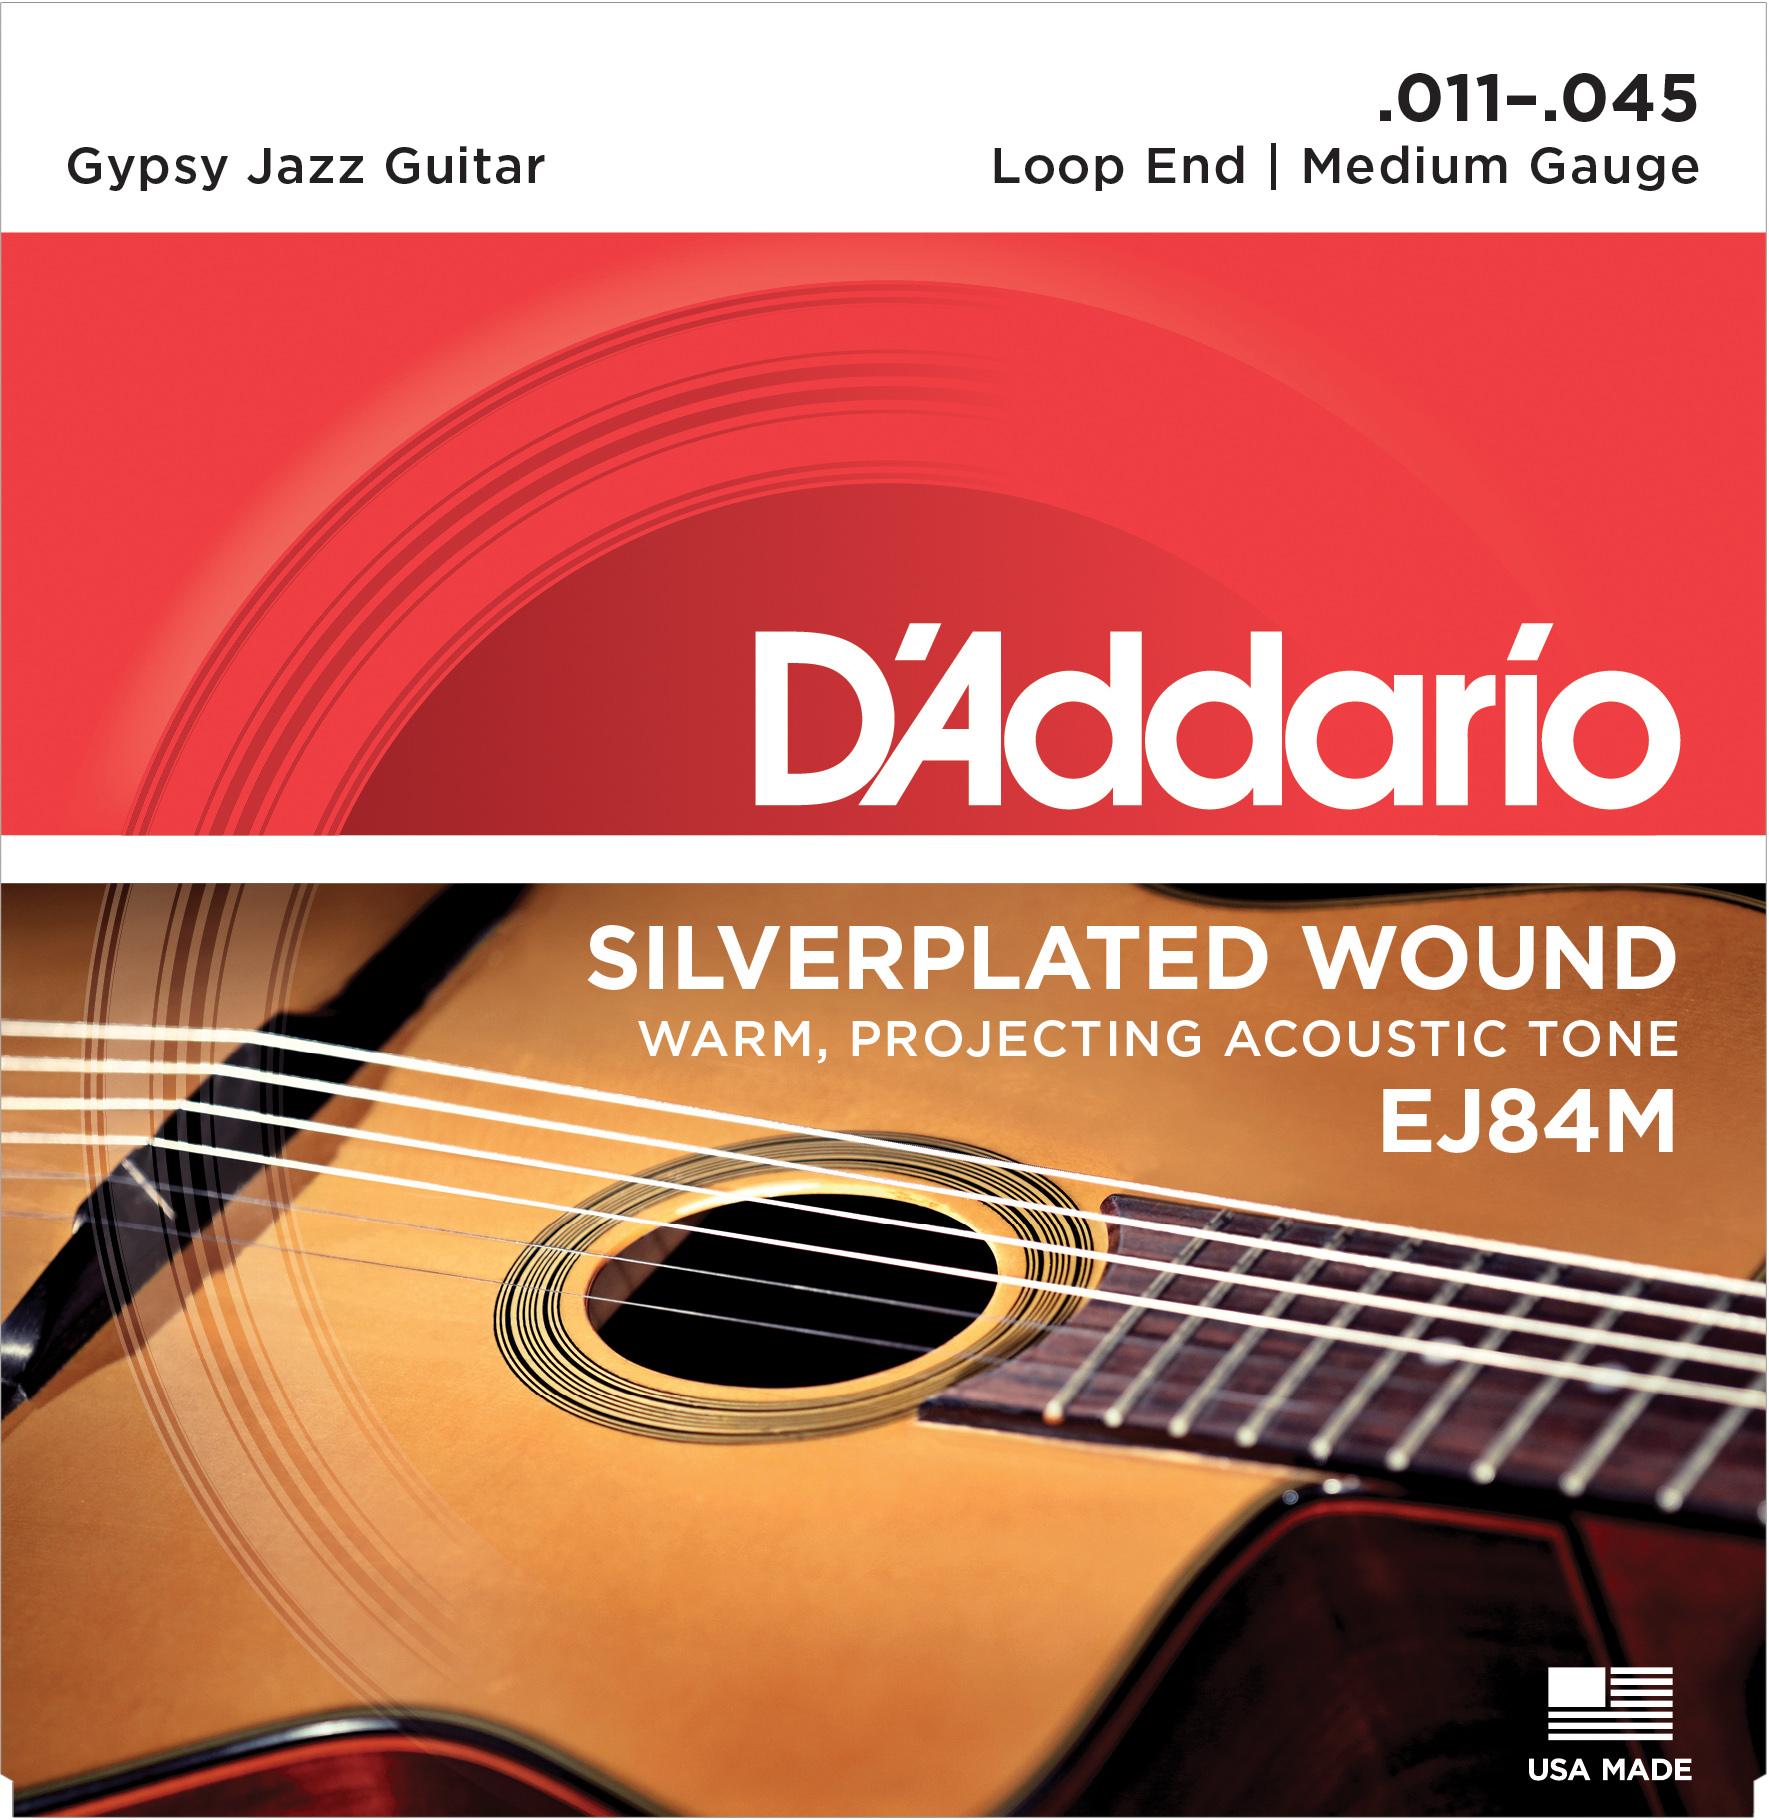 D'Addario EJ84M Gypsy Jazz Acoustic Guitar Strings Loop End, Medium, 11-45